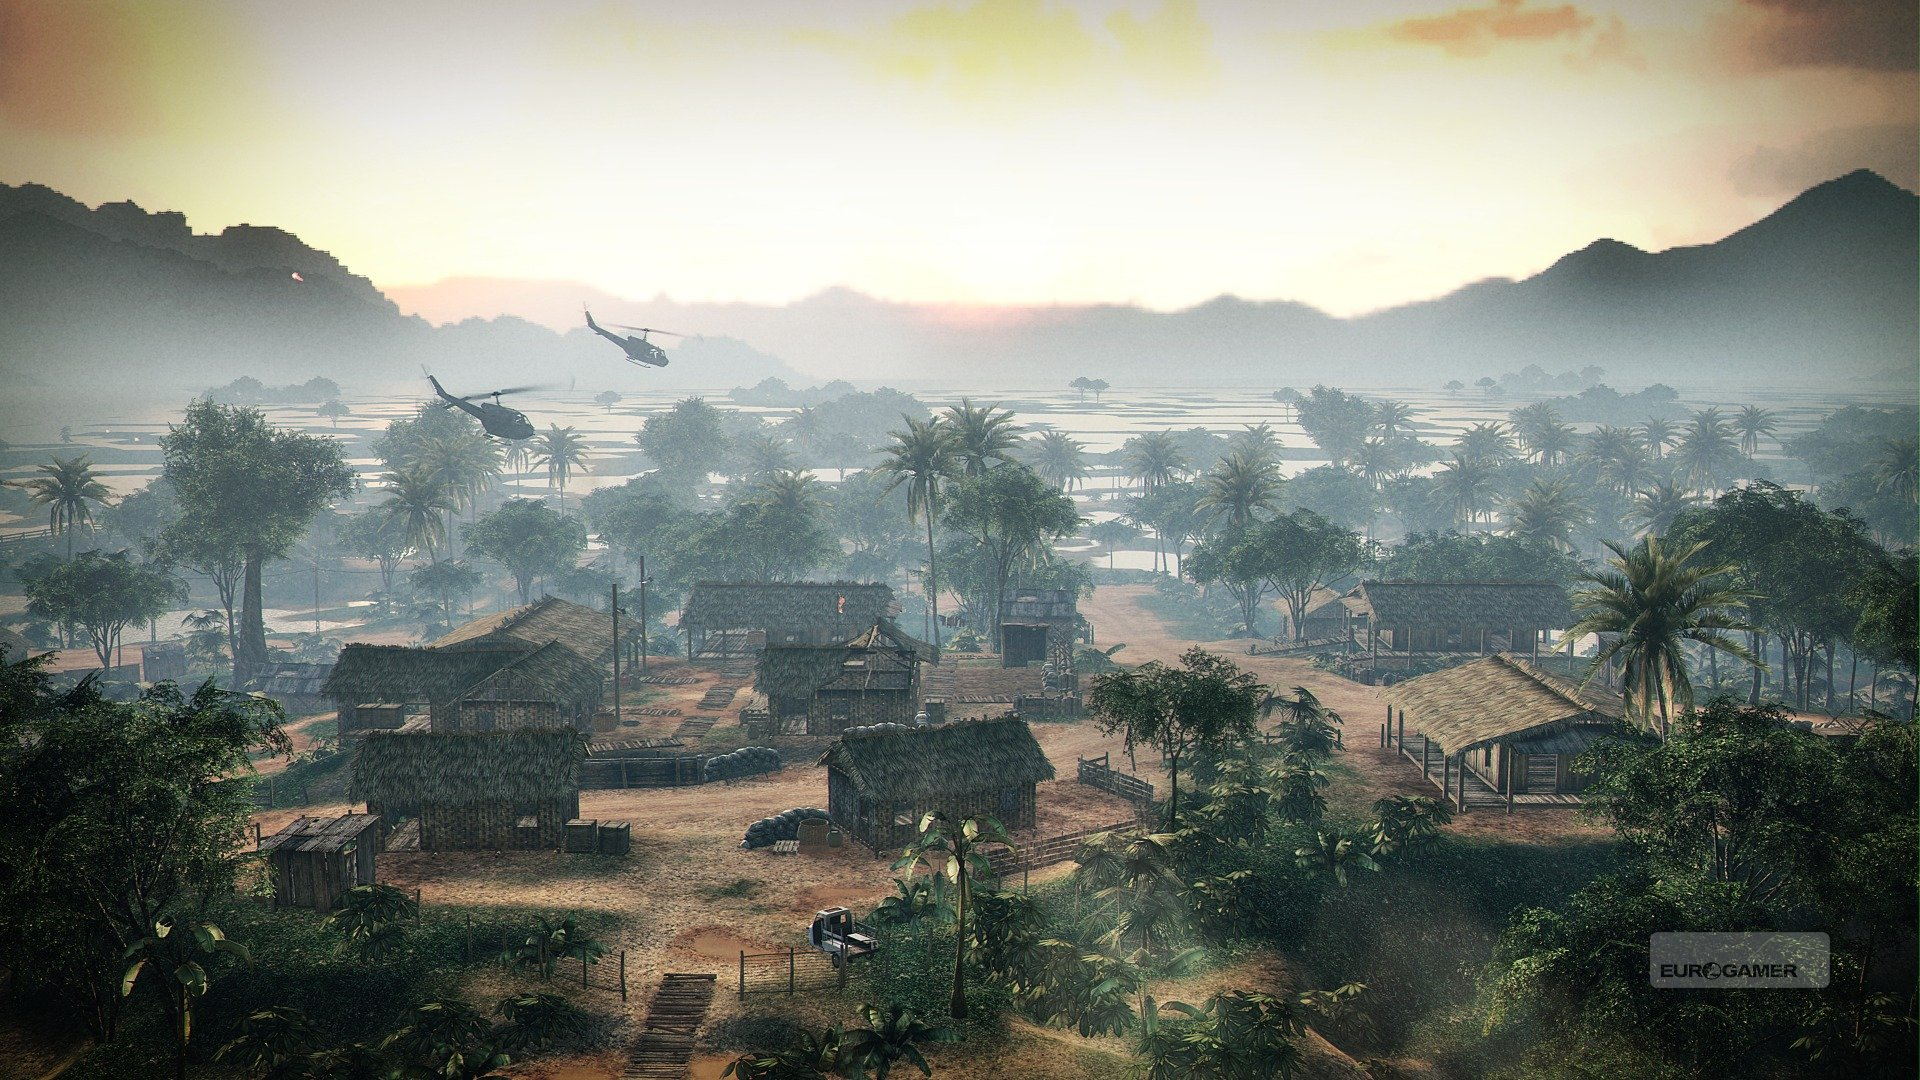 Battlefield Bad Company 2   Vietnam desktop wallpaper 29 of 39 1920x1080